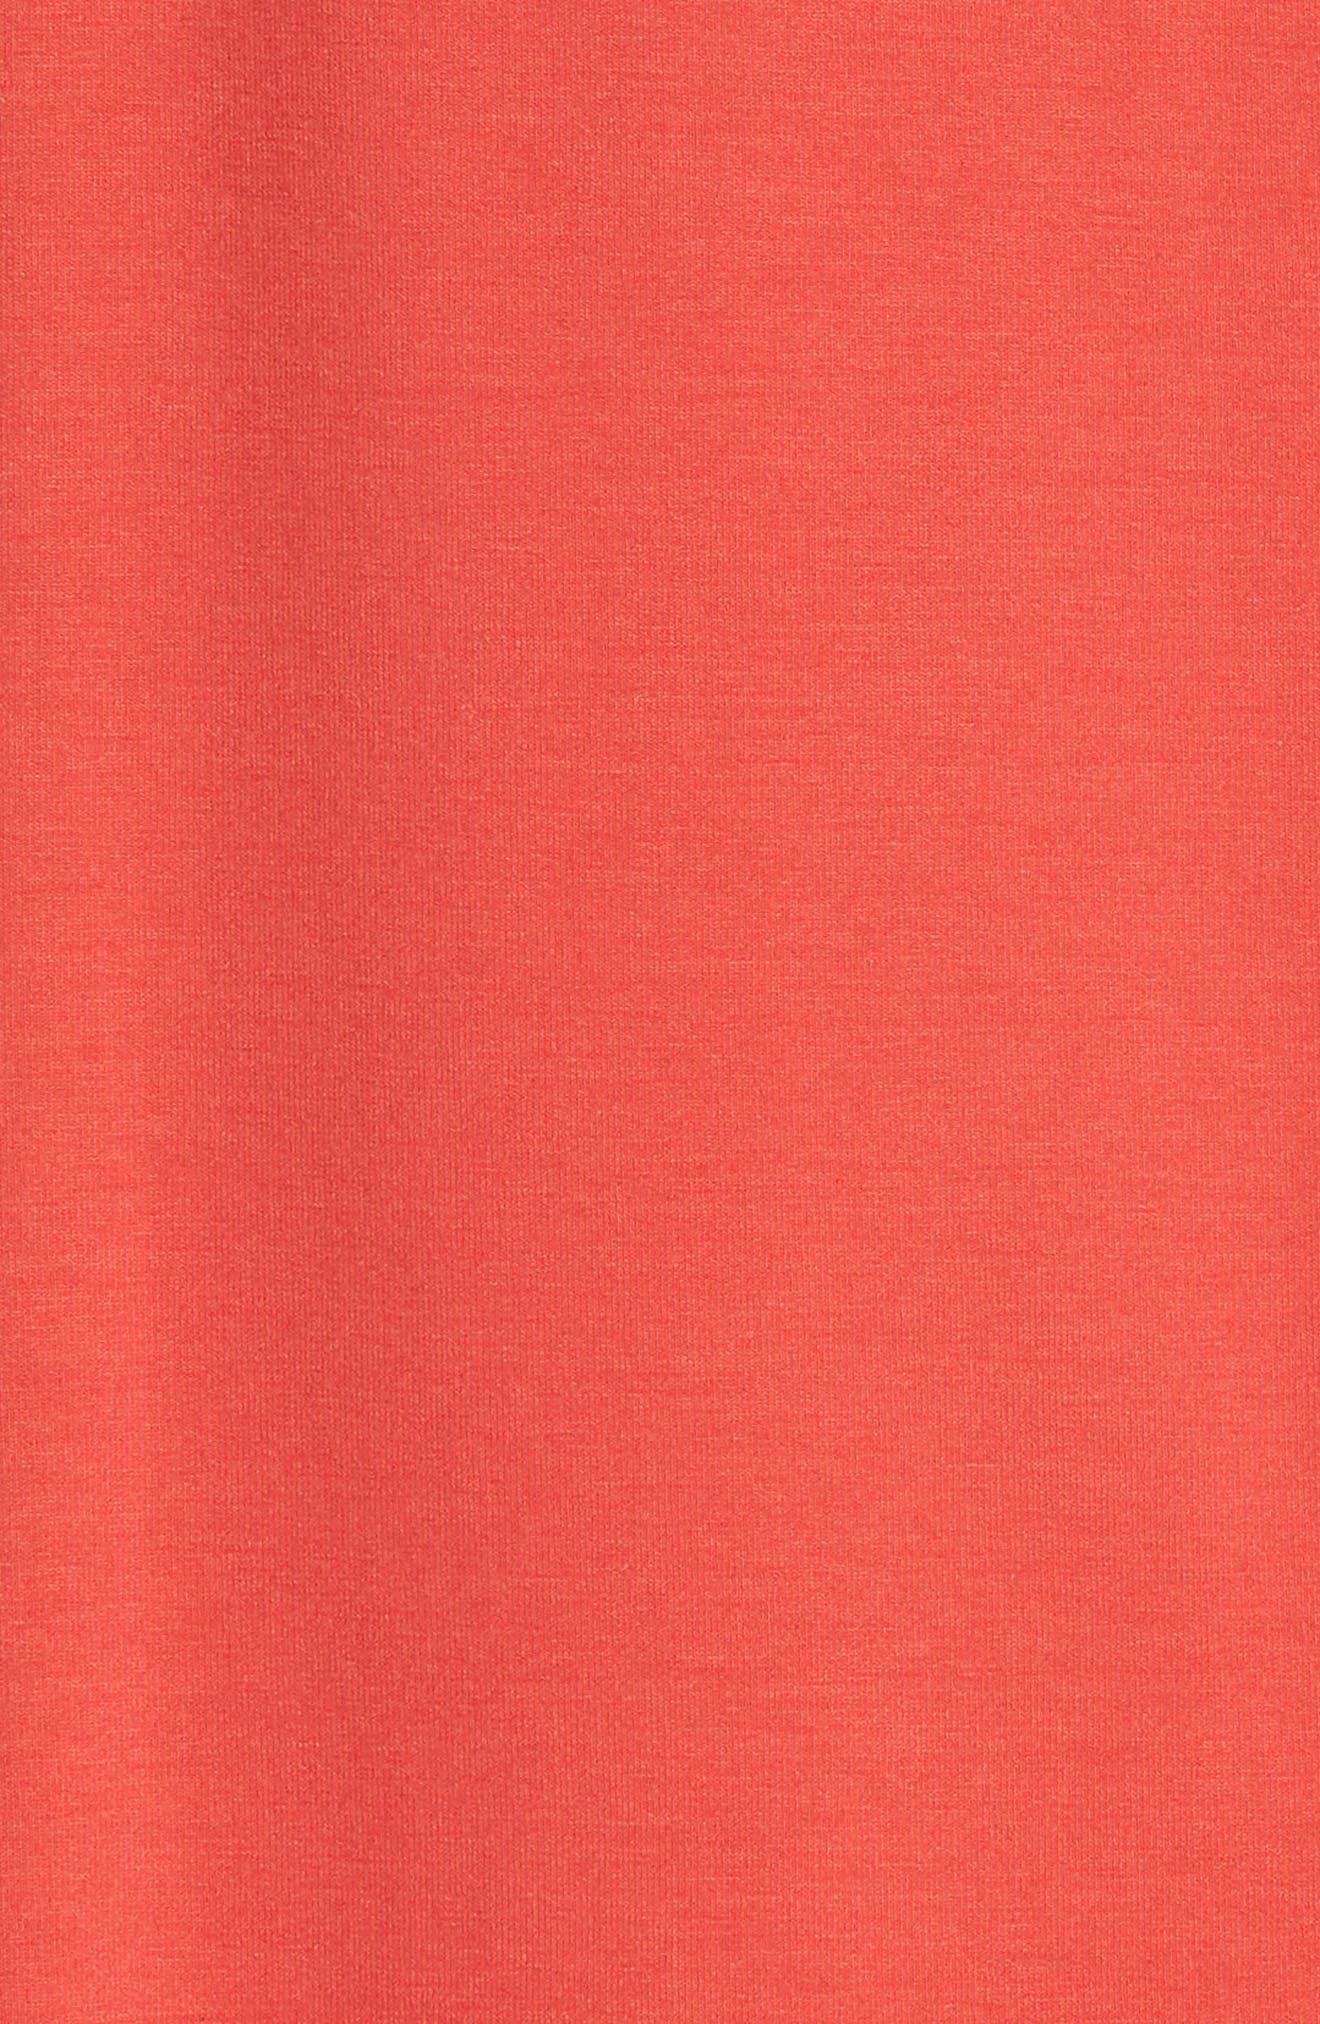 Alternate Image 5  - Eileen Fisher Lightweight Jersey Shift Dress (Regular & Petite) (Nordstrom Exclusive)